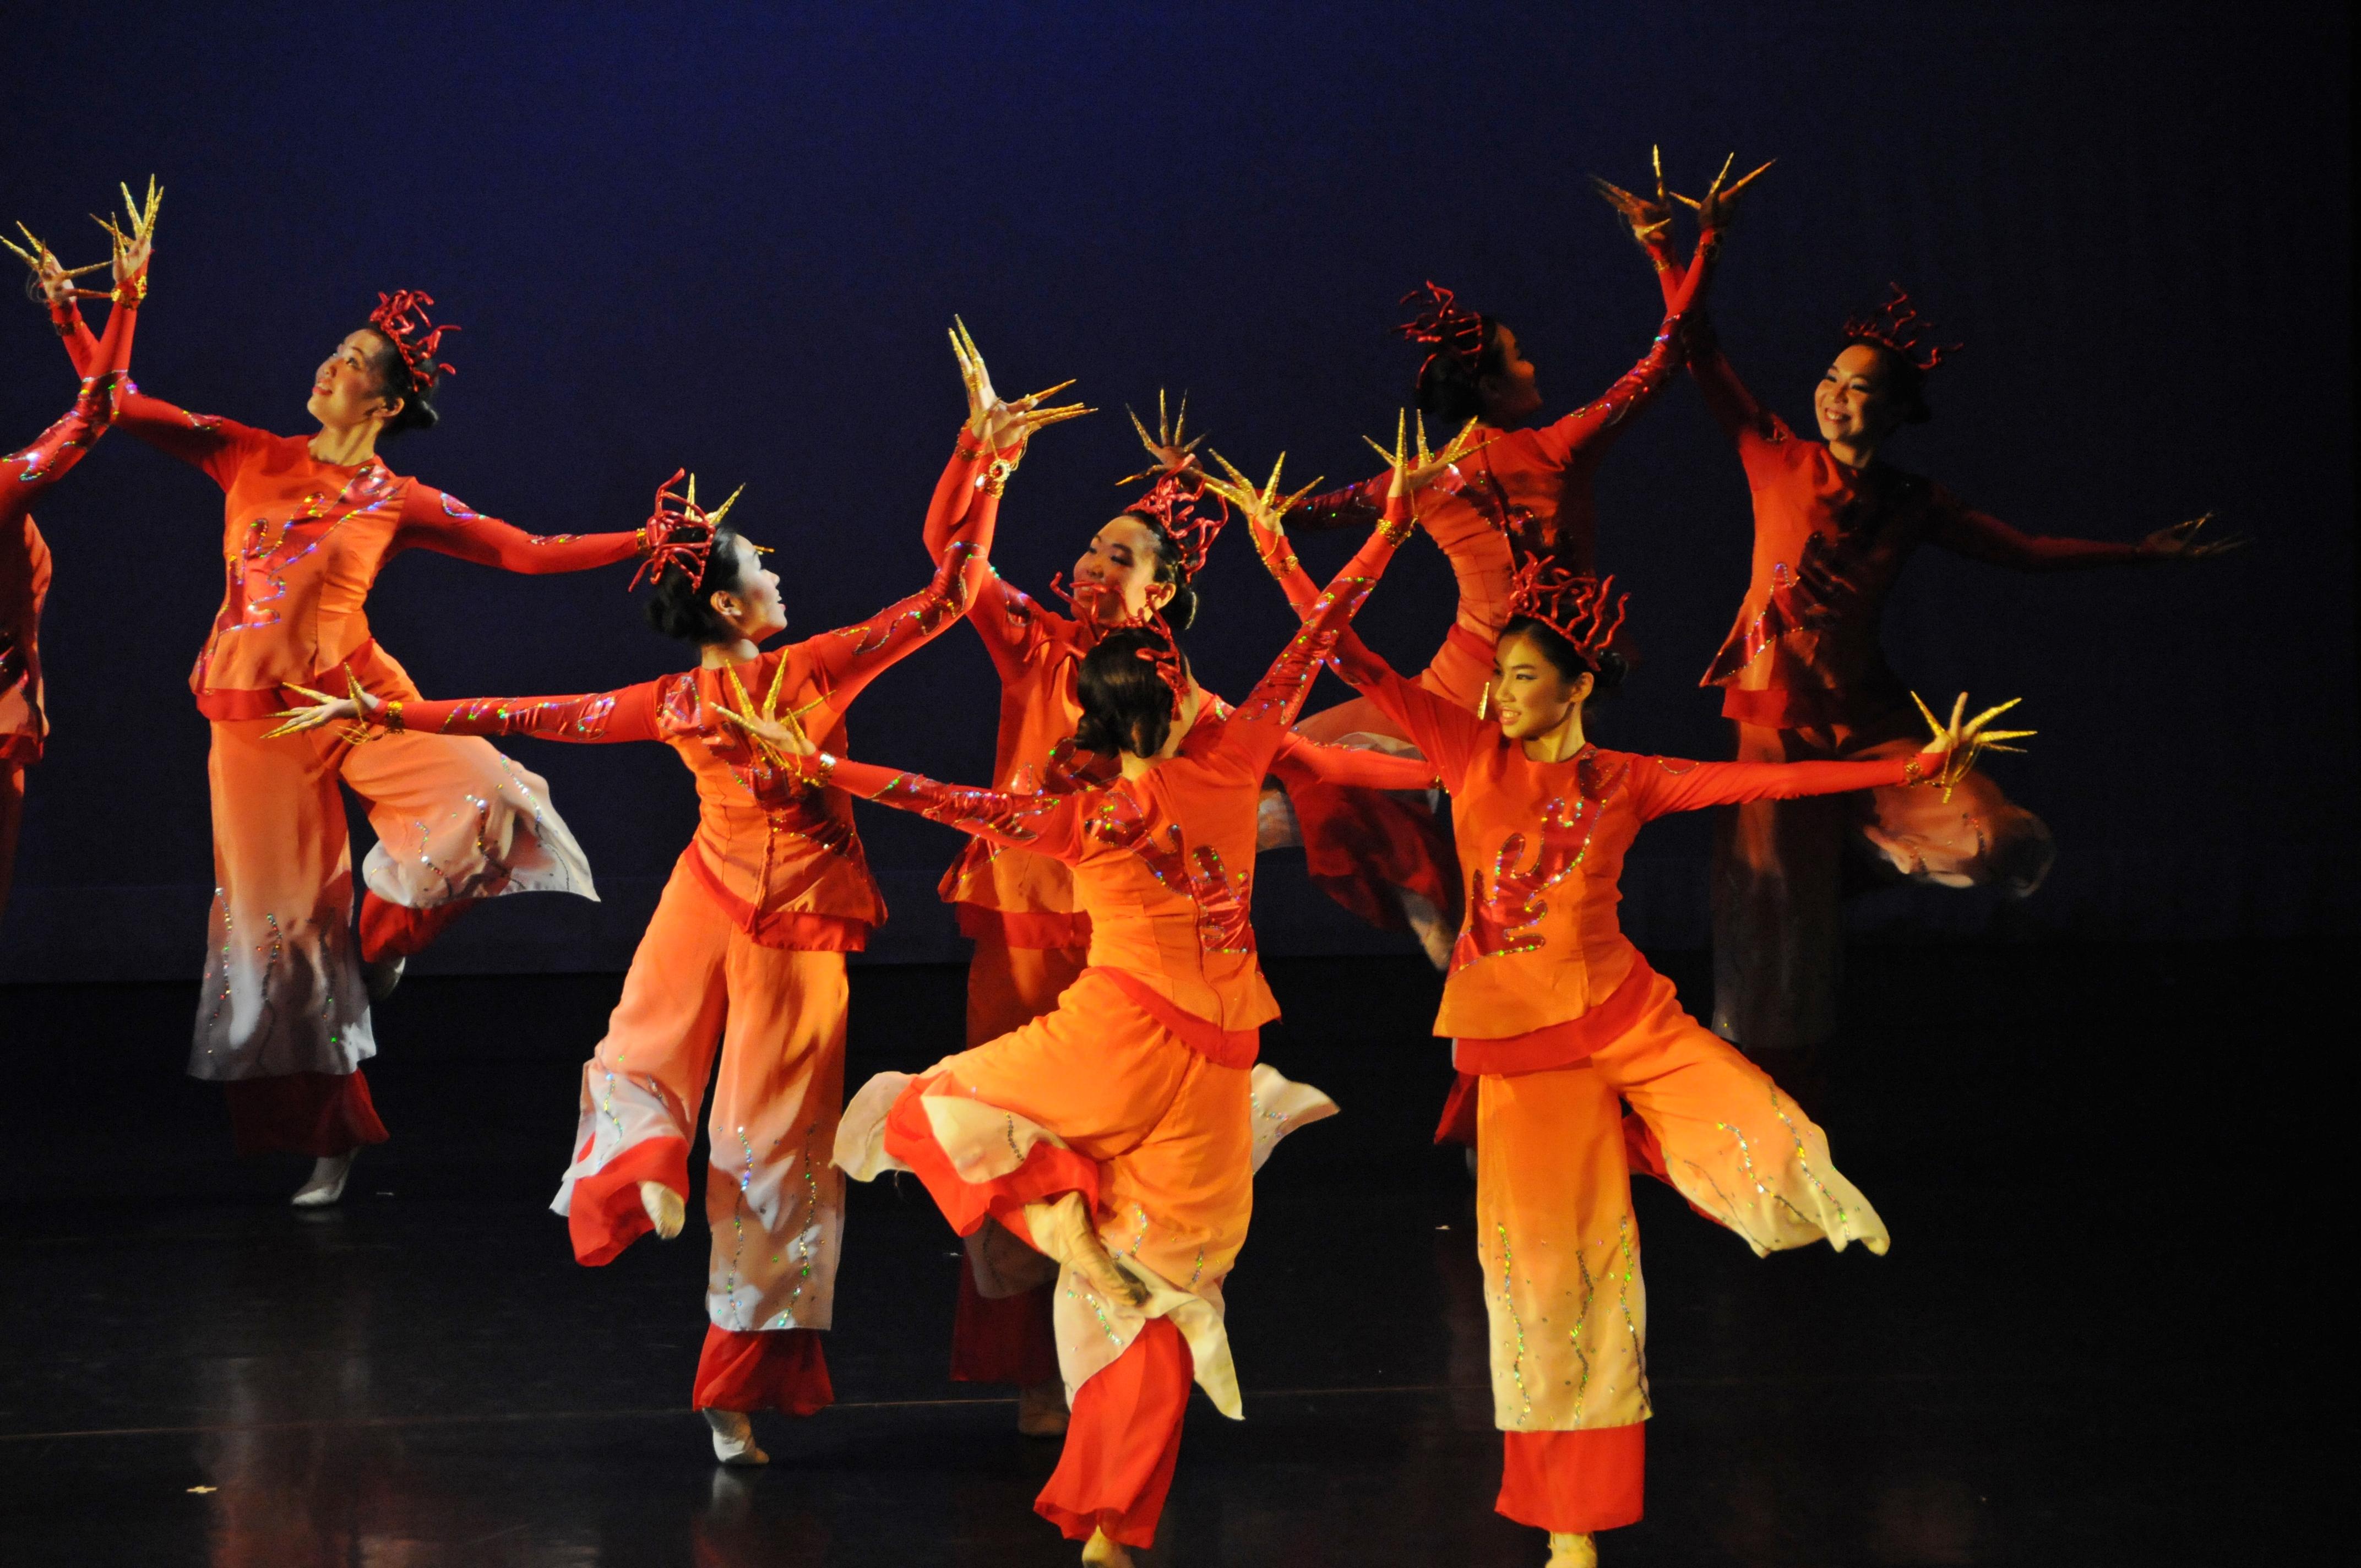 https://hkcchoir.org/sites/default/files/youth_dance_2016wu_yuan_chuan_cheng_4.jpg